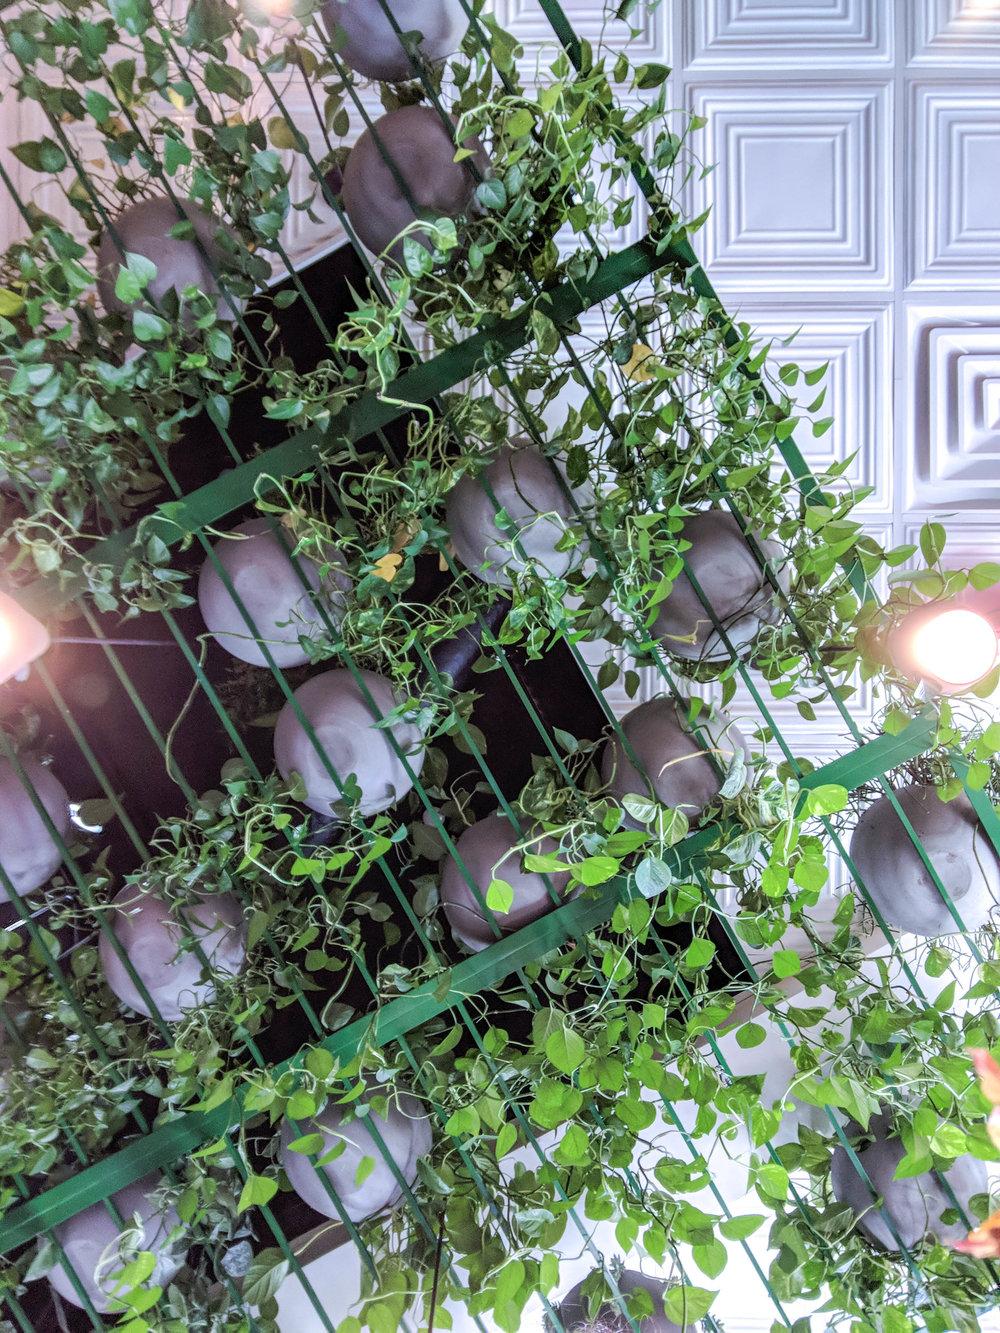 bri rinehart; photography; plants